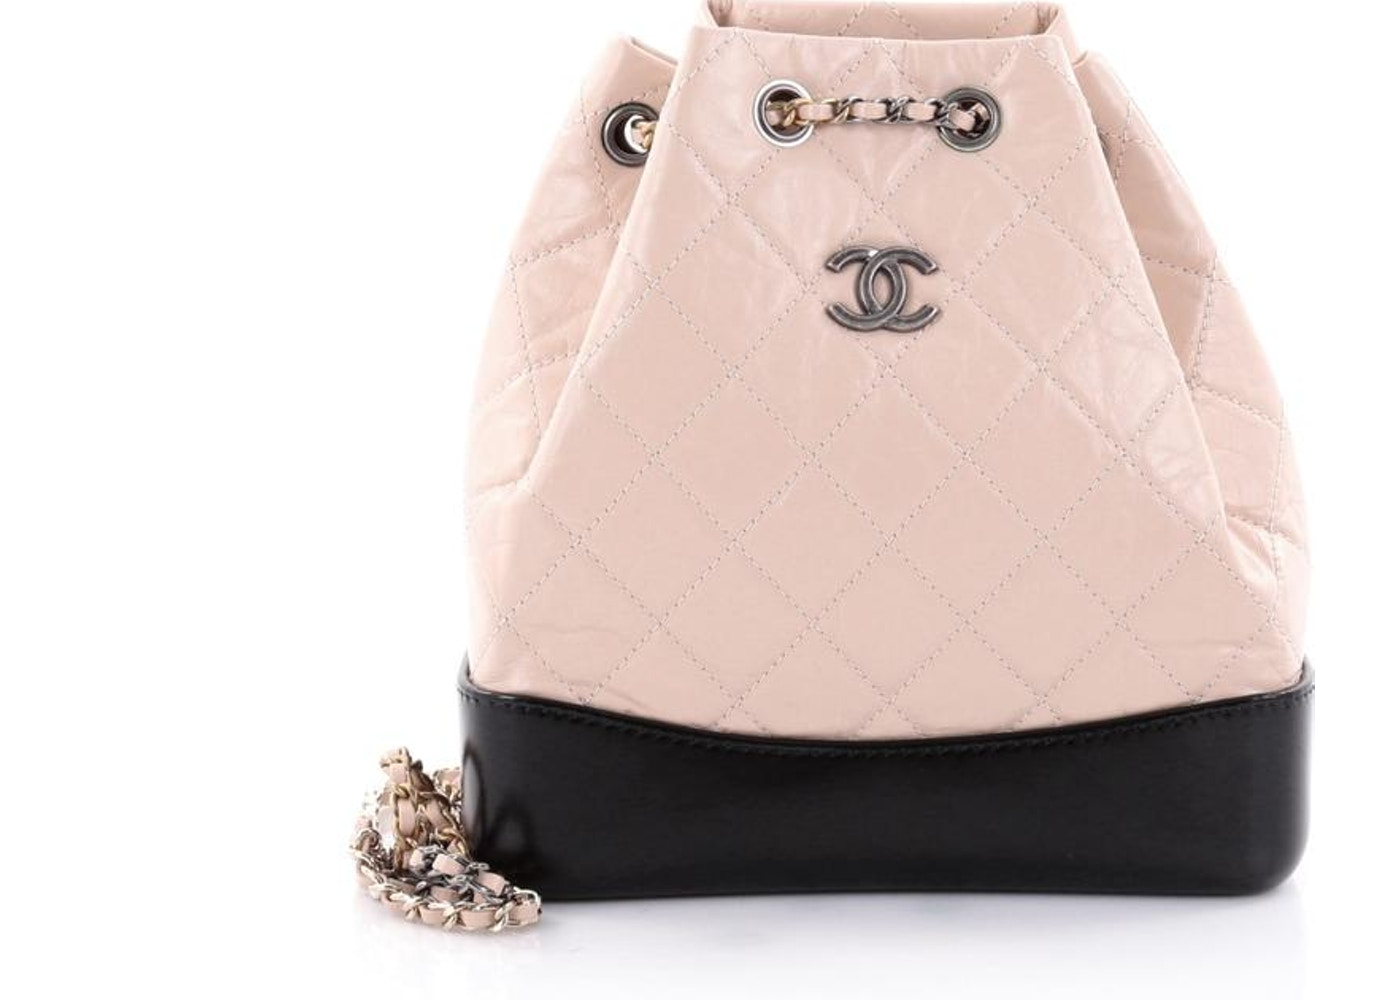 00c1e2ce2c3f Chanel Gabrielle Backpack Diamond Quilted Small. Diamond Quilted Small